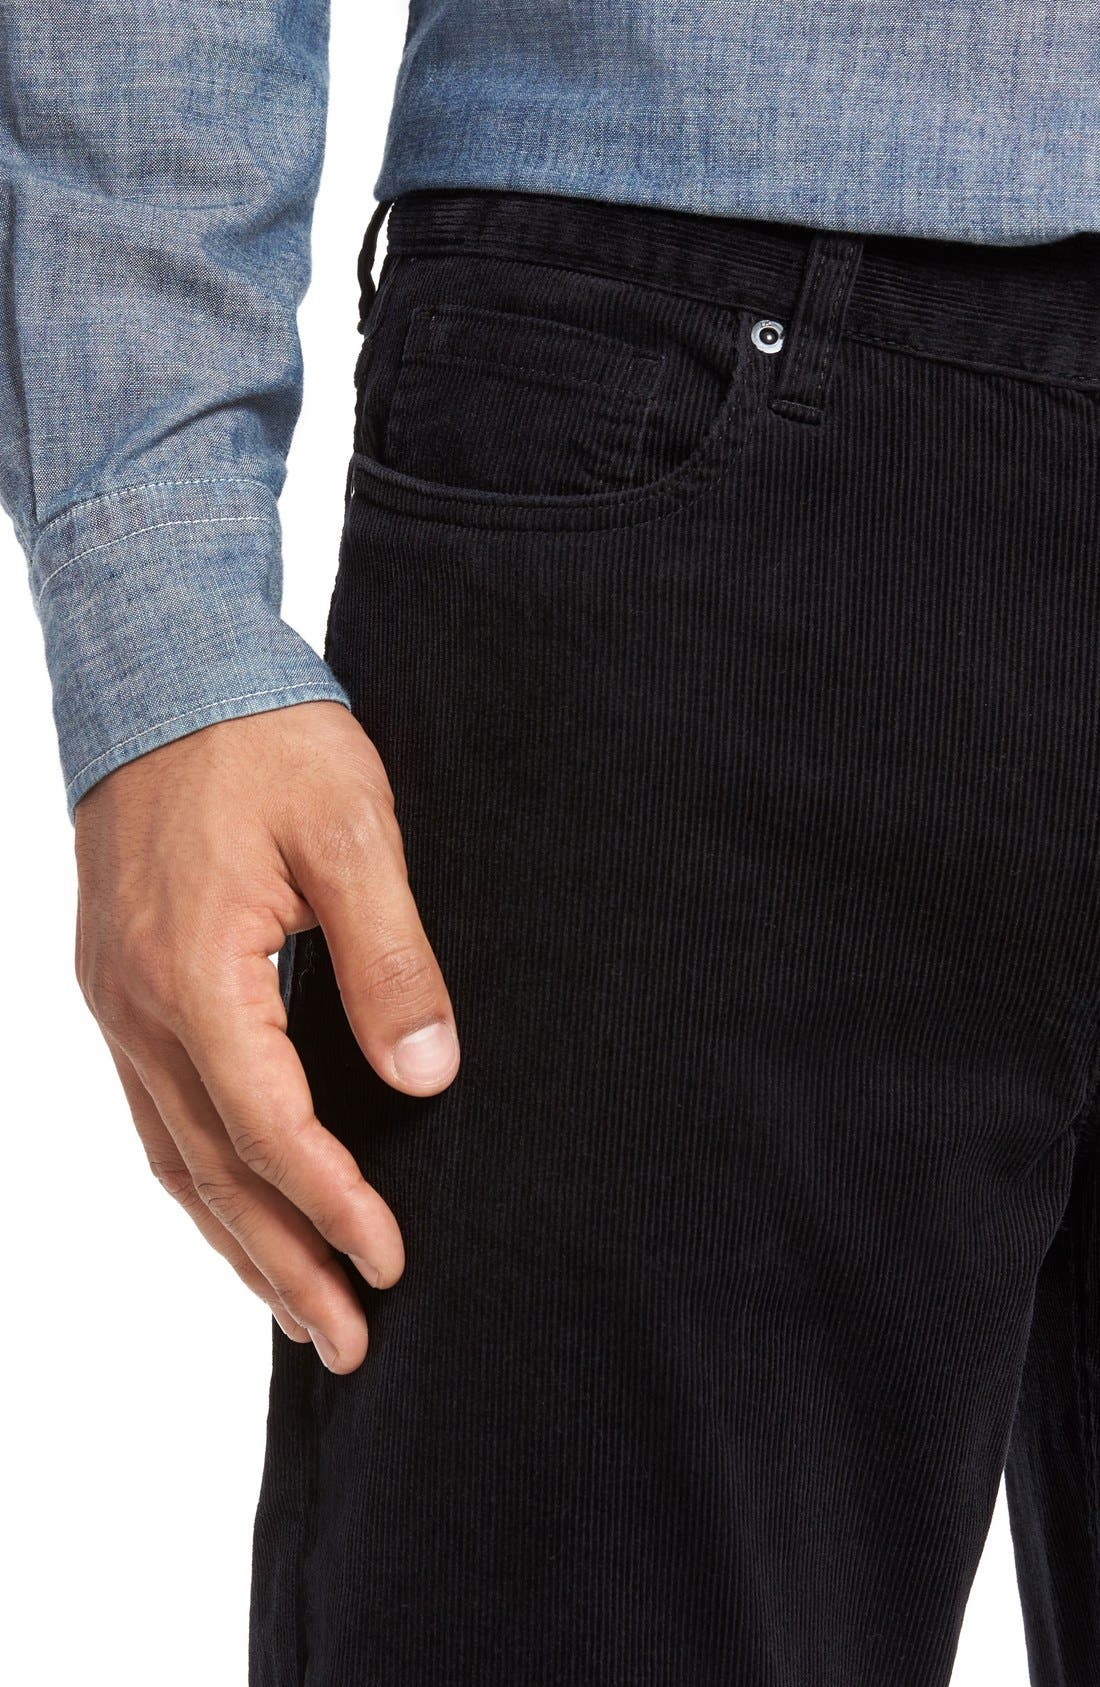 Greenwood Stretch Corduroy Pants,                             Alternate thumbnail 5, color,                             001